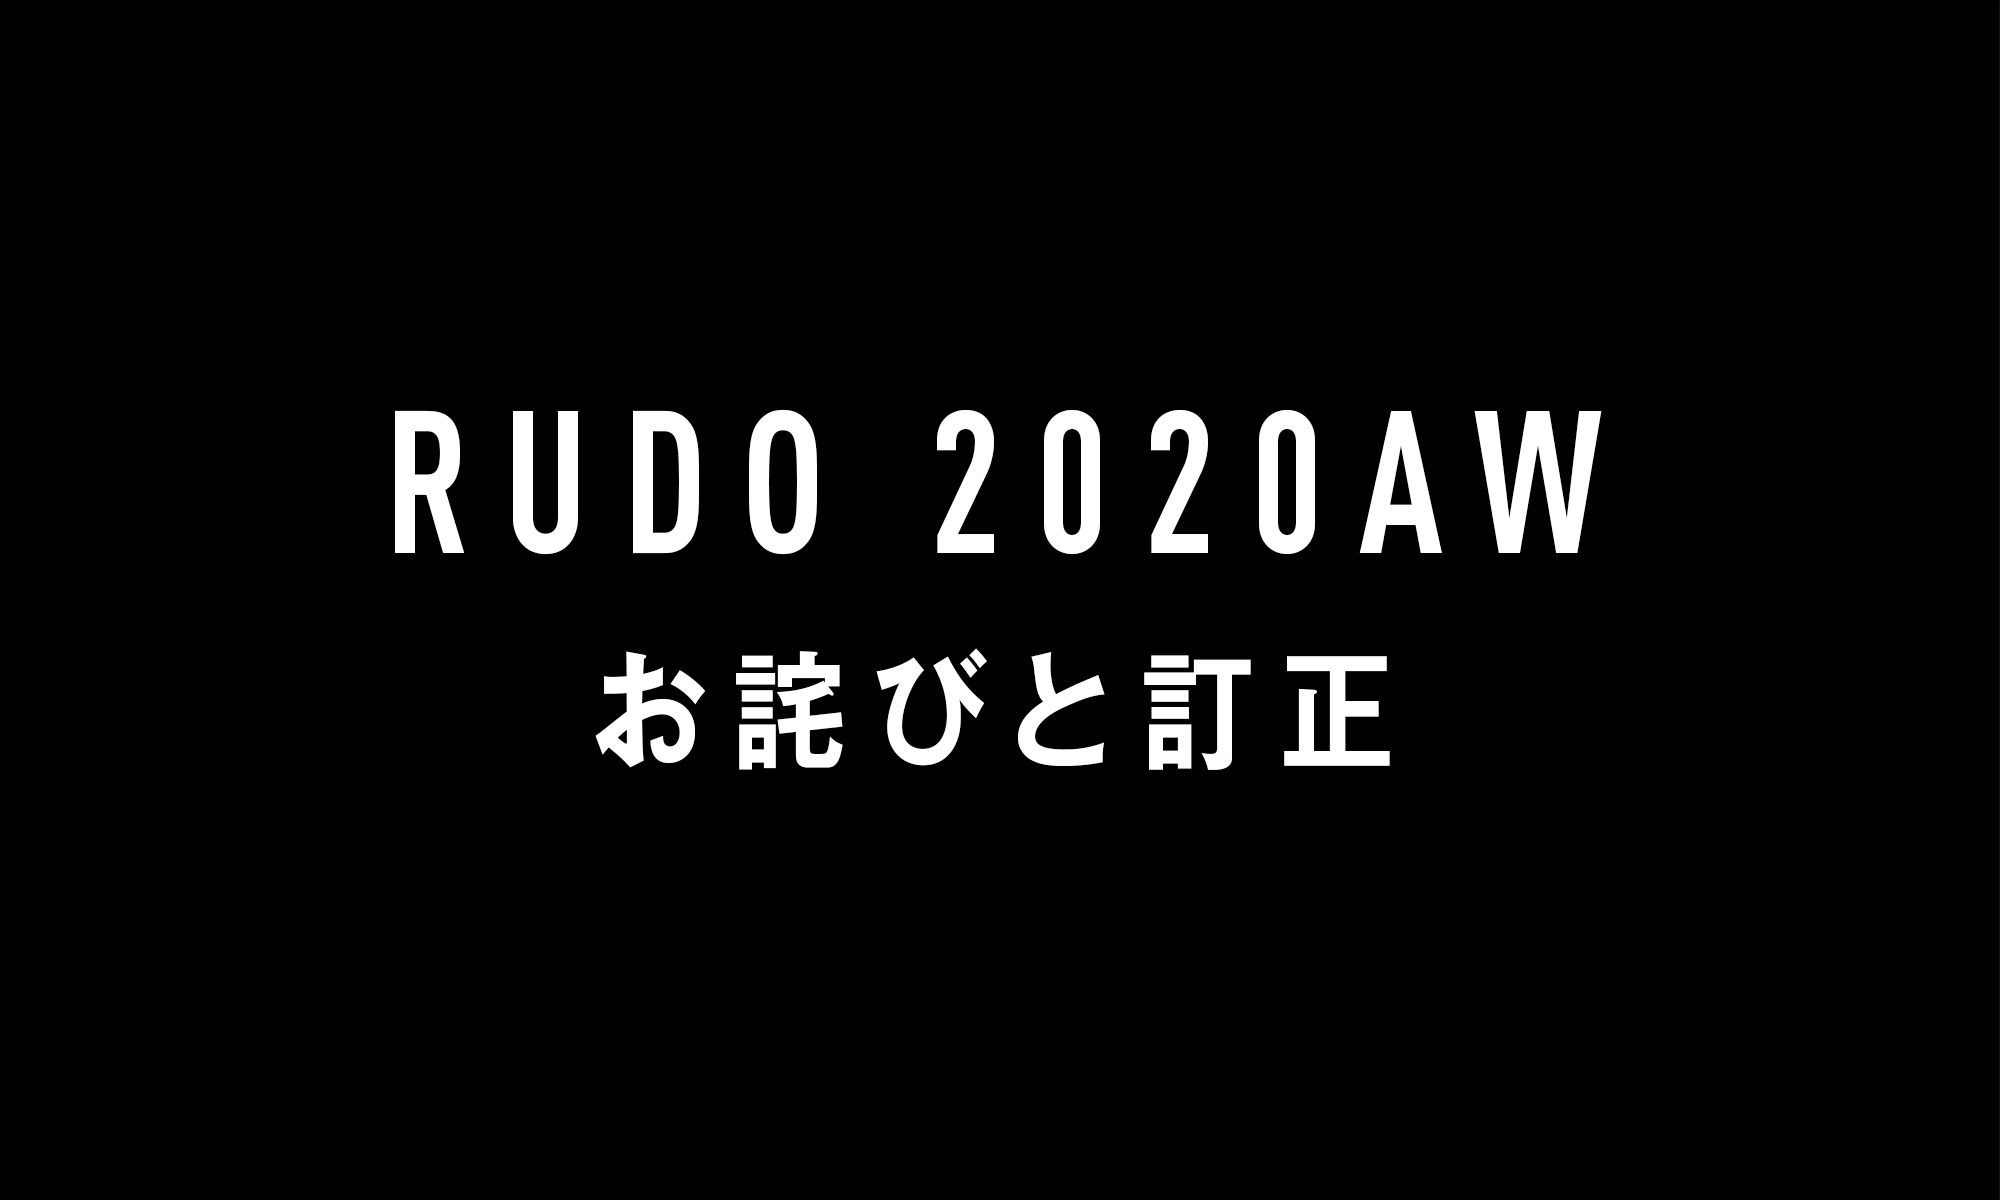 RUDO 2020AW お詫びと訂正